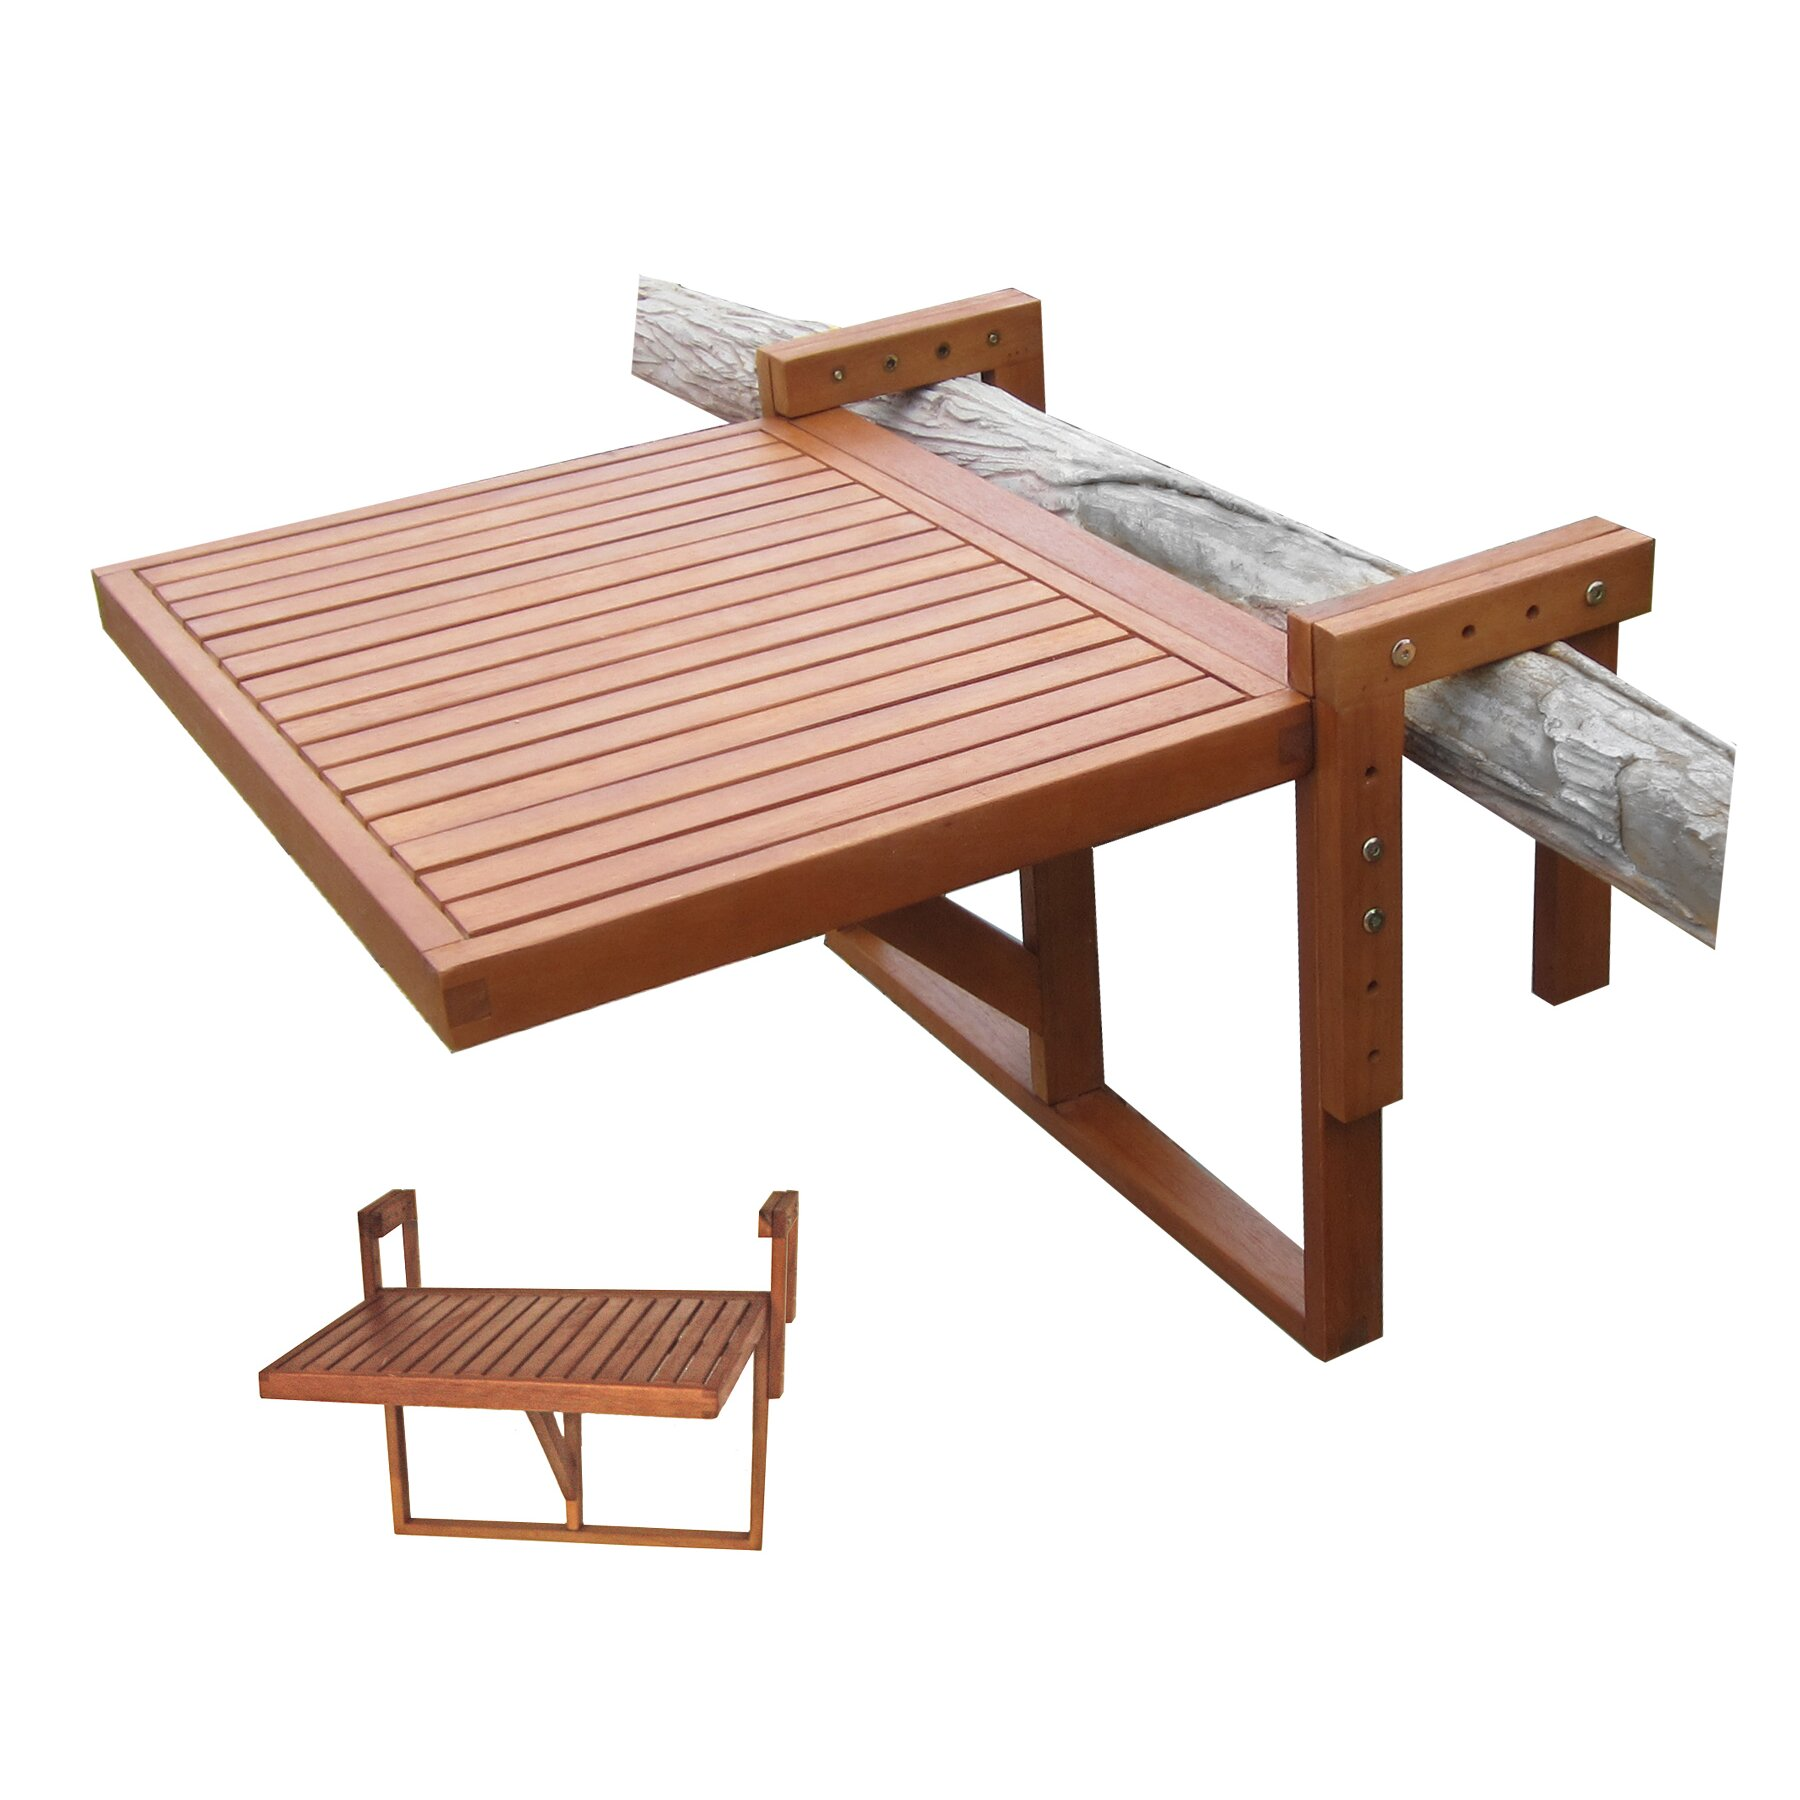 caracella balkontisch berkeley bewertungen. Black Bedroom Furniture Sets. Home Design Ideas